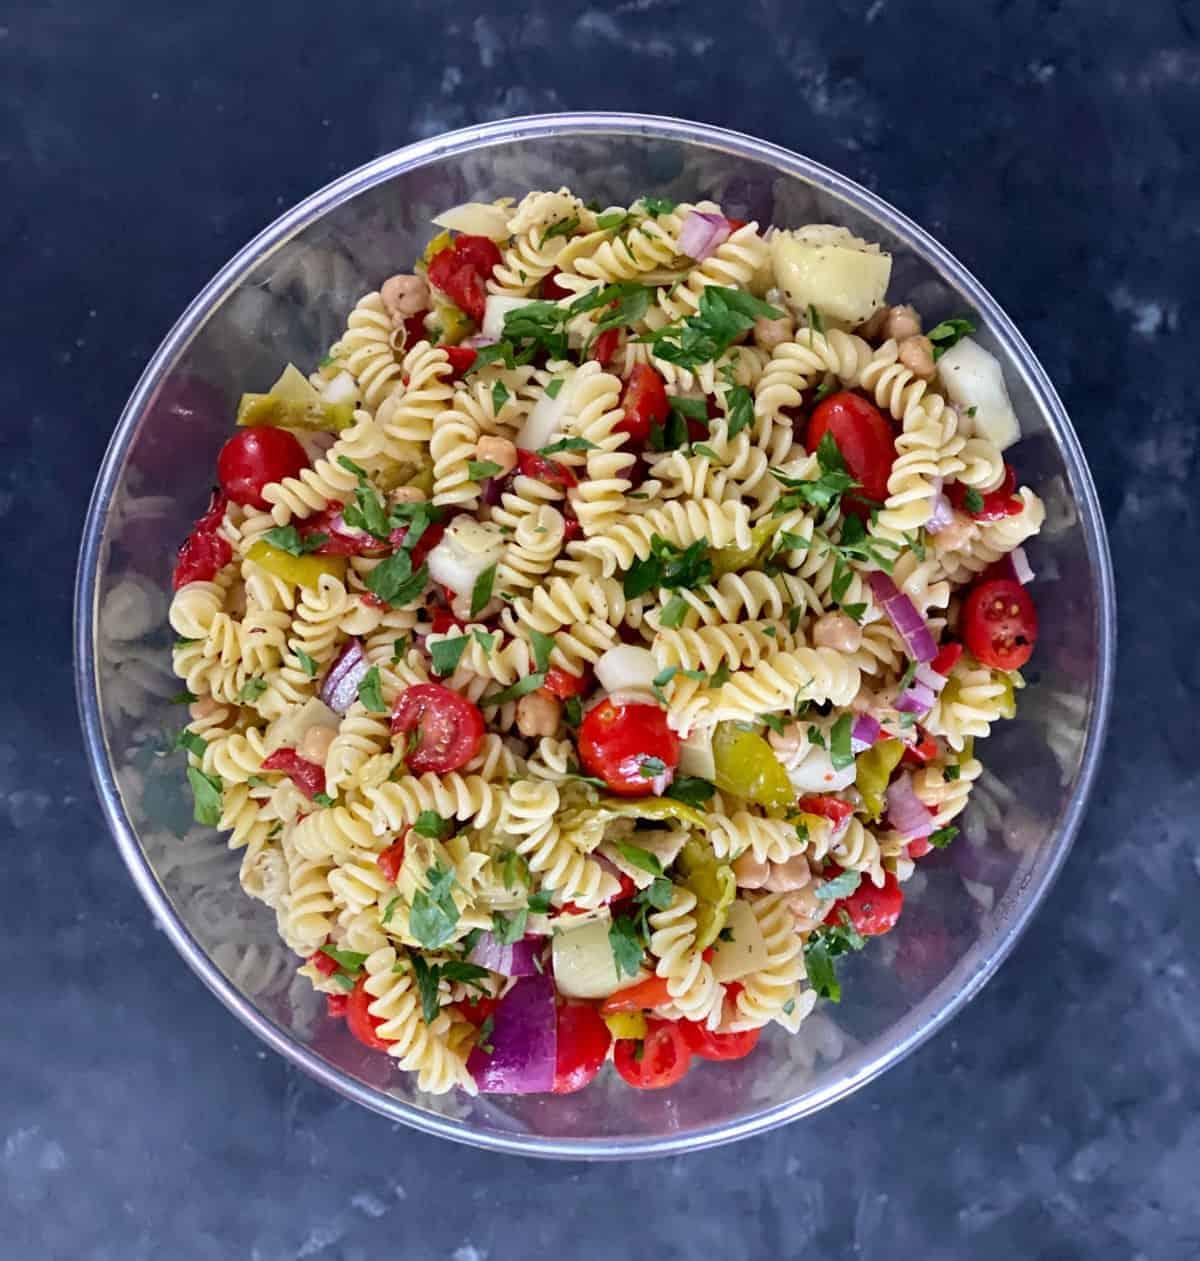 Italian pasta salad with veggies